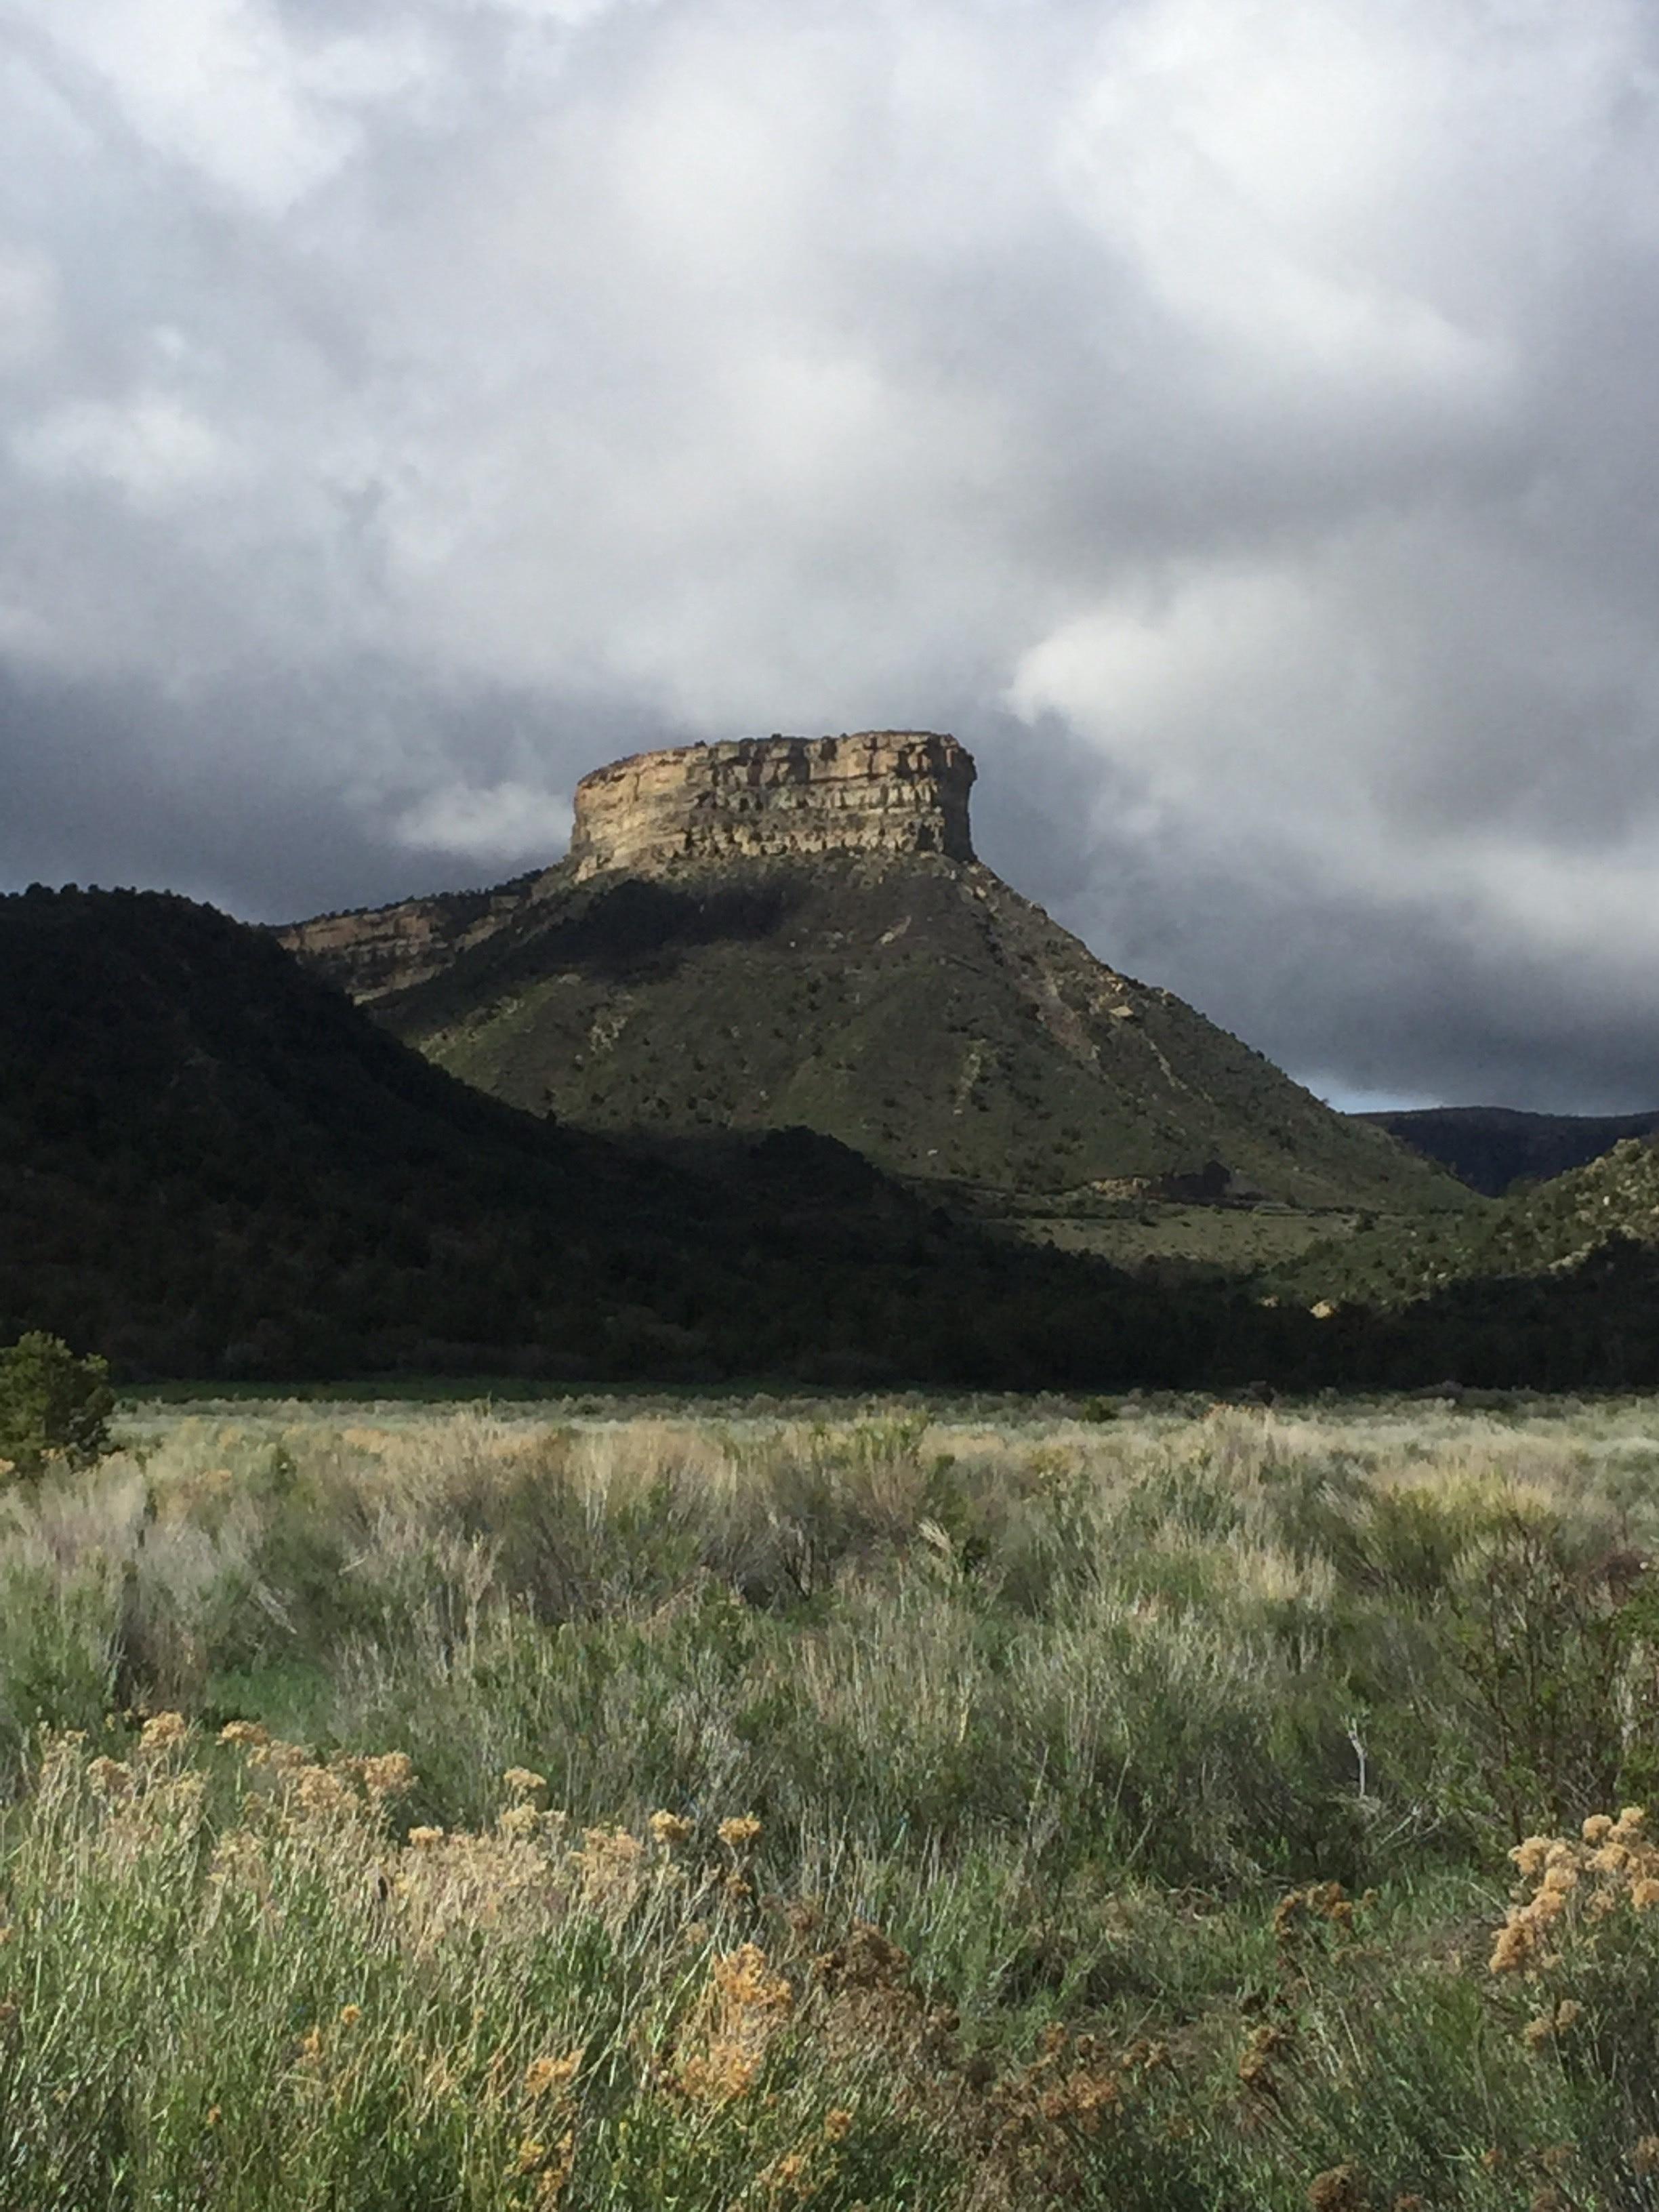 Mancos, Colorado, United States of America